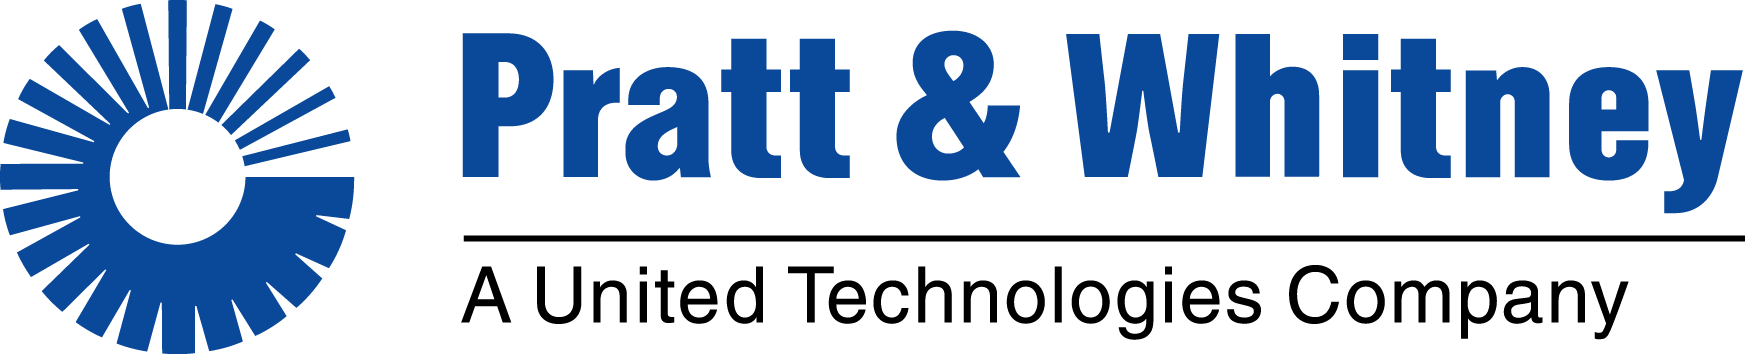 PattWhitney BlueBlack RGB